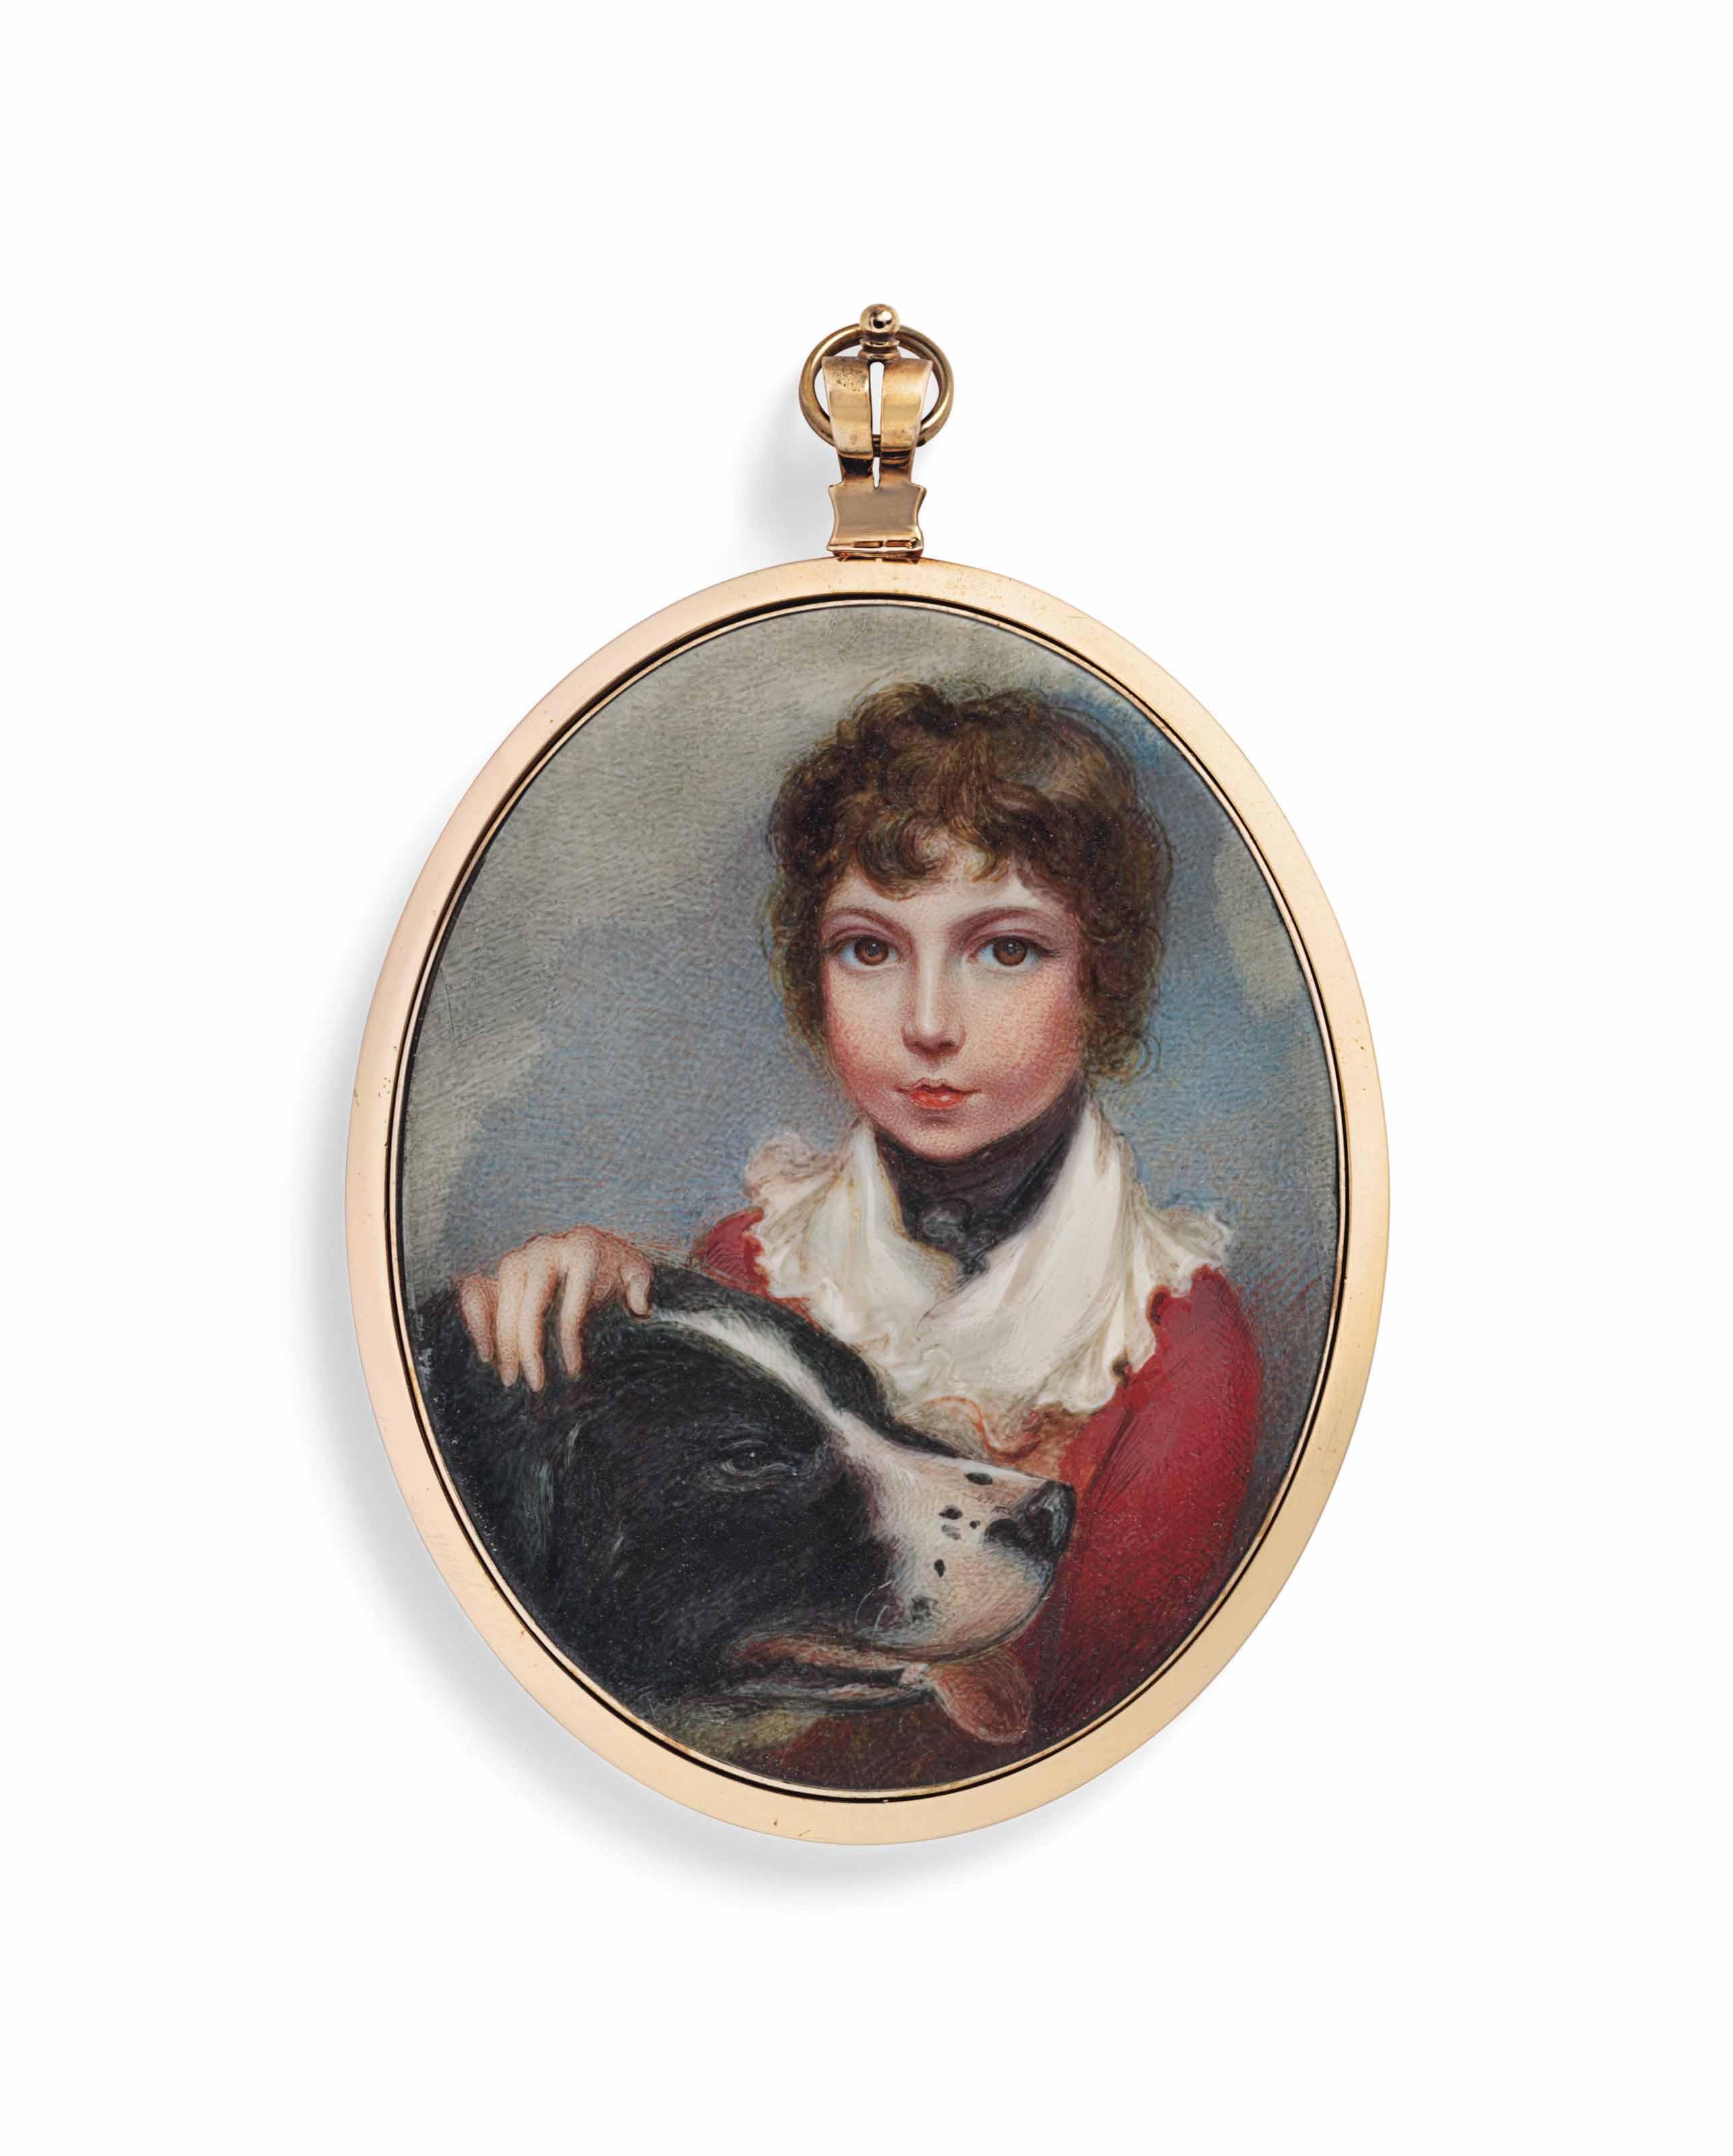 ANNE MEE, NÉE FOLDSONE (BRITISH, C. 1770/1775 - 1851)